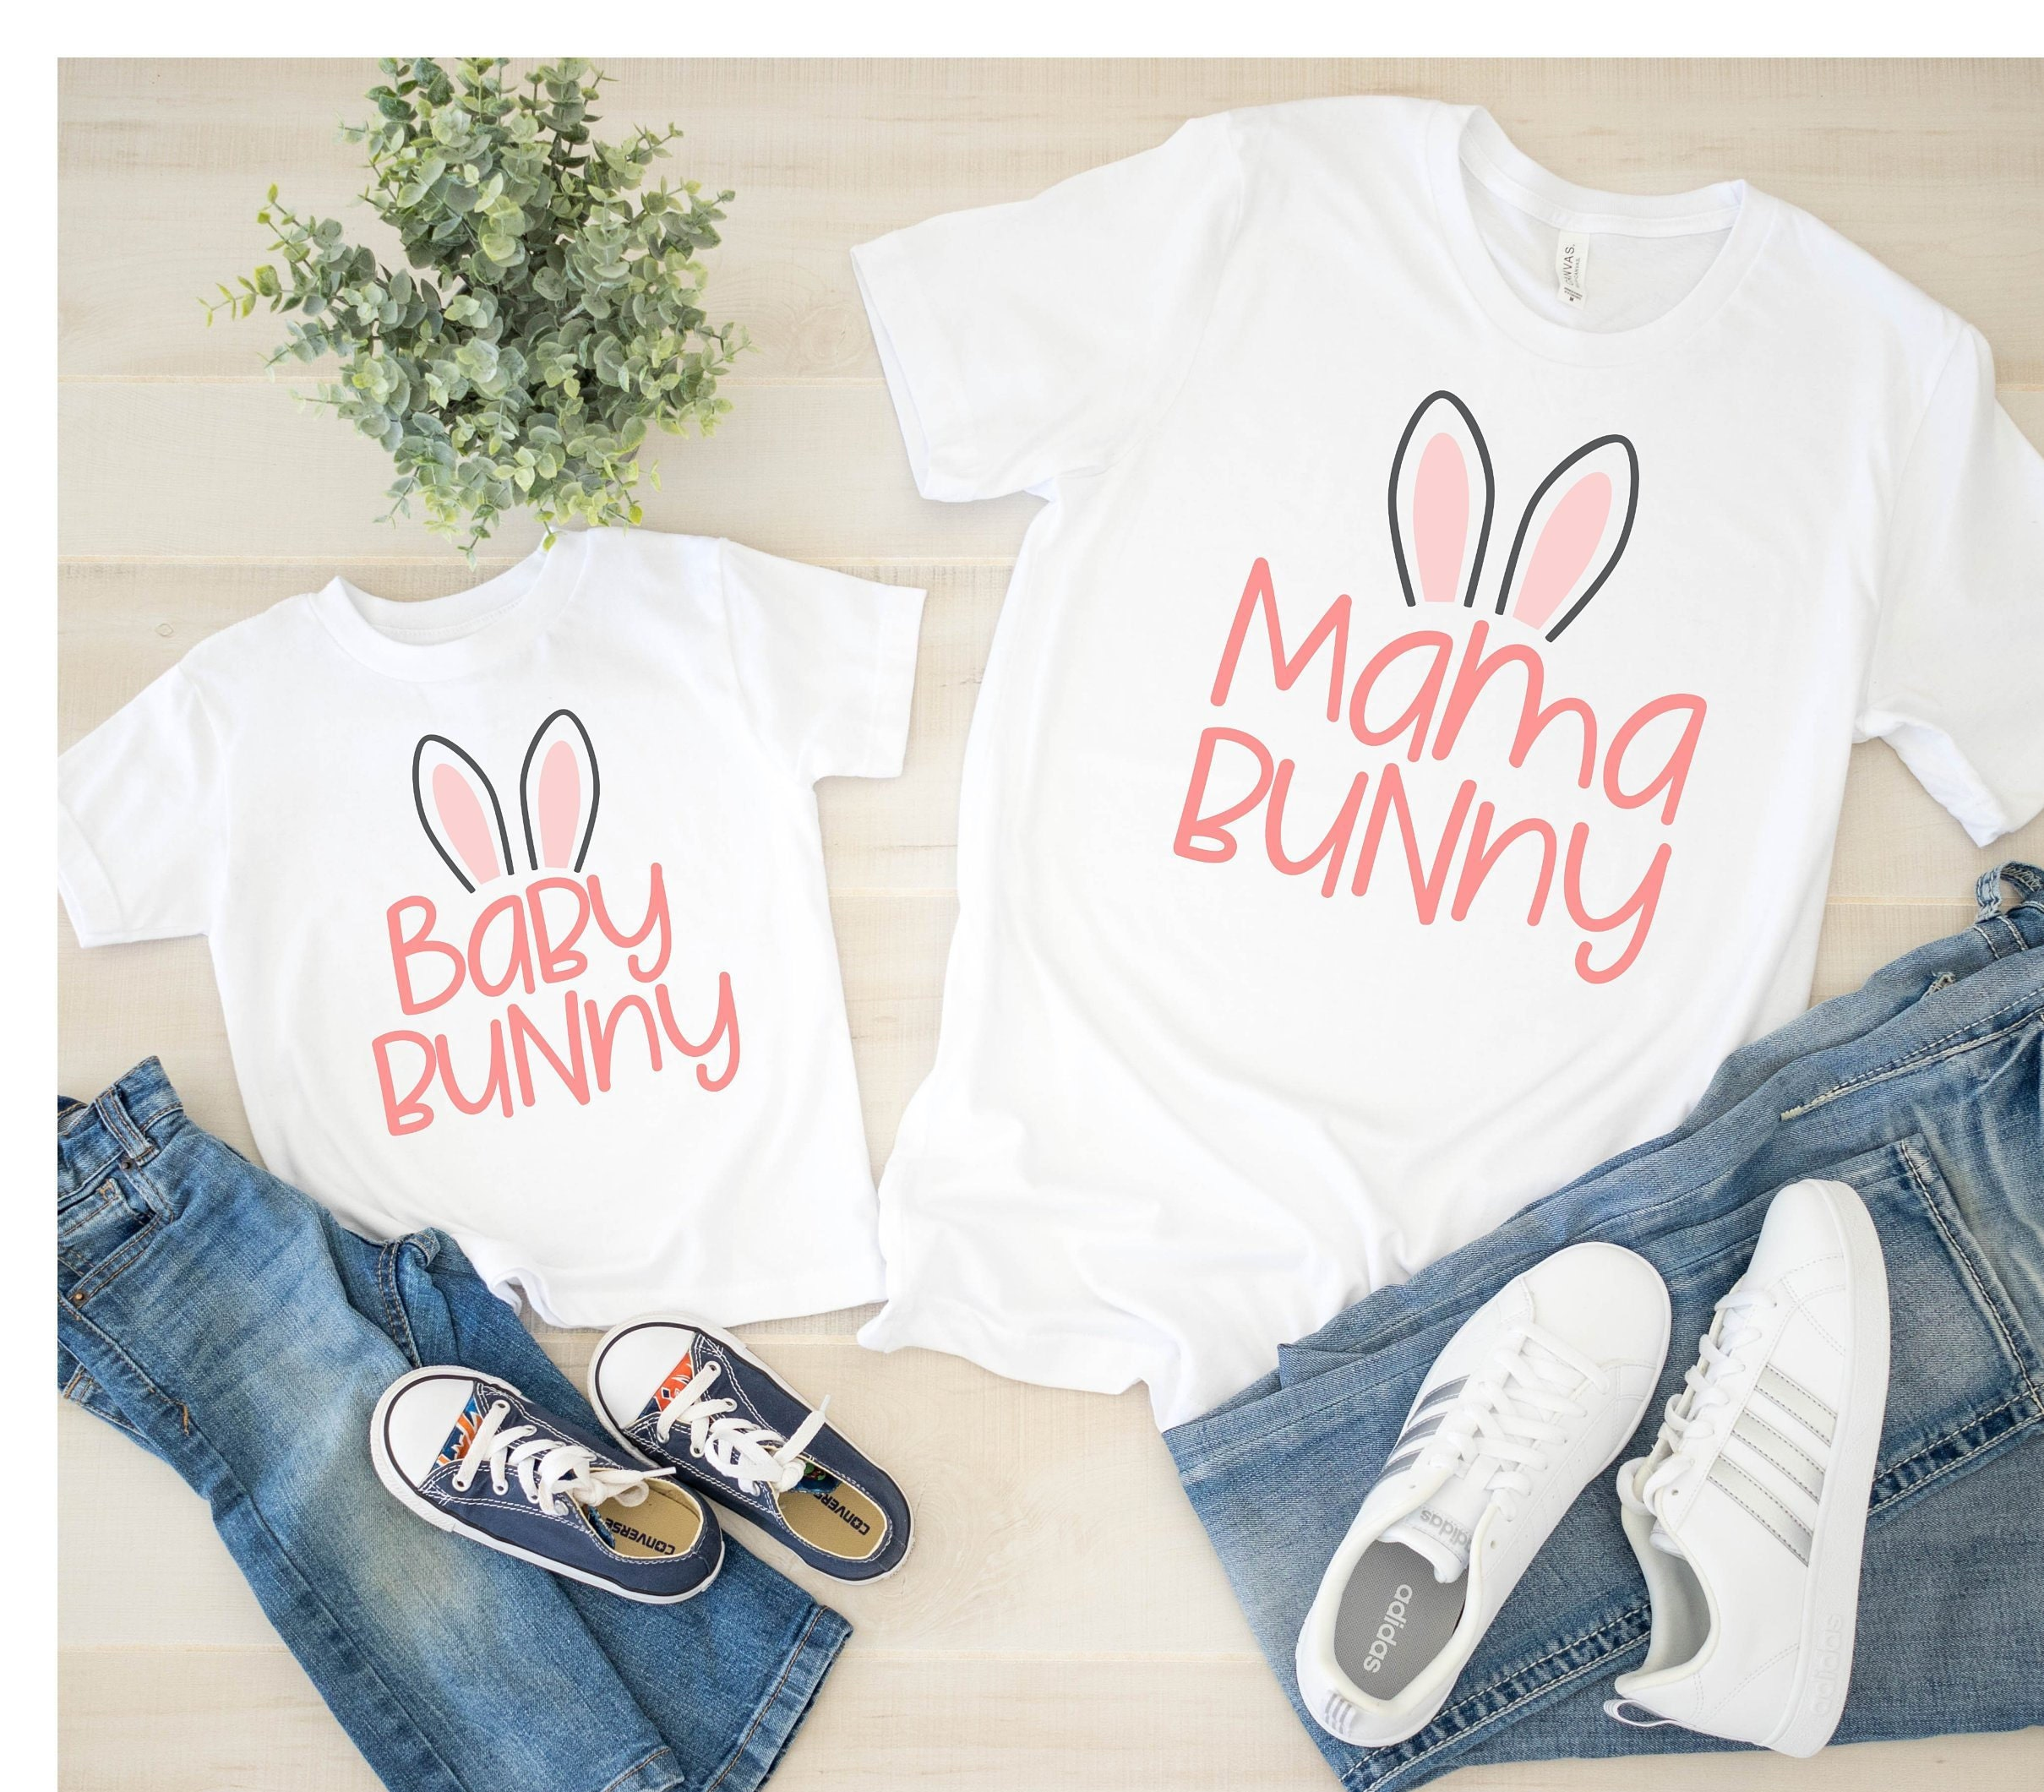 Mama Bunny & Baby Bunny Matching Shirts   Mother Daughter Shirts   Matching Easter   Easter Shirts   Easter Bunny   Mom And Daughter